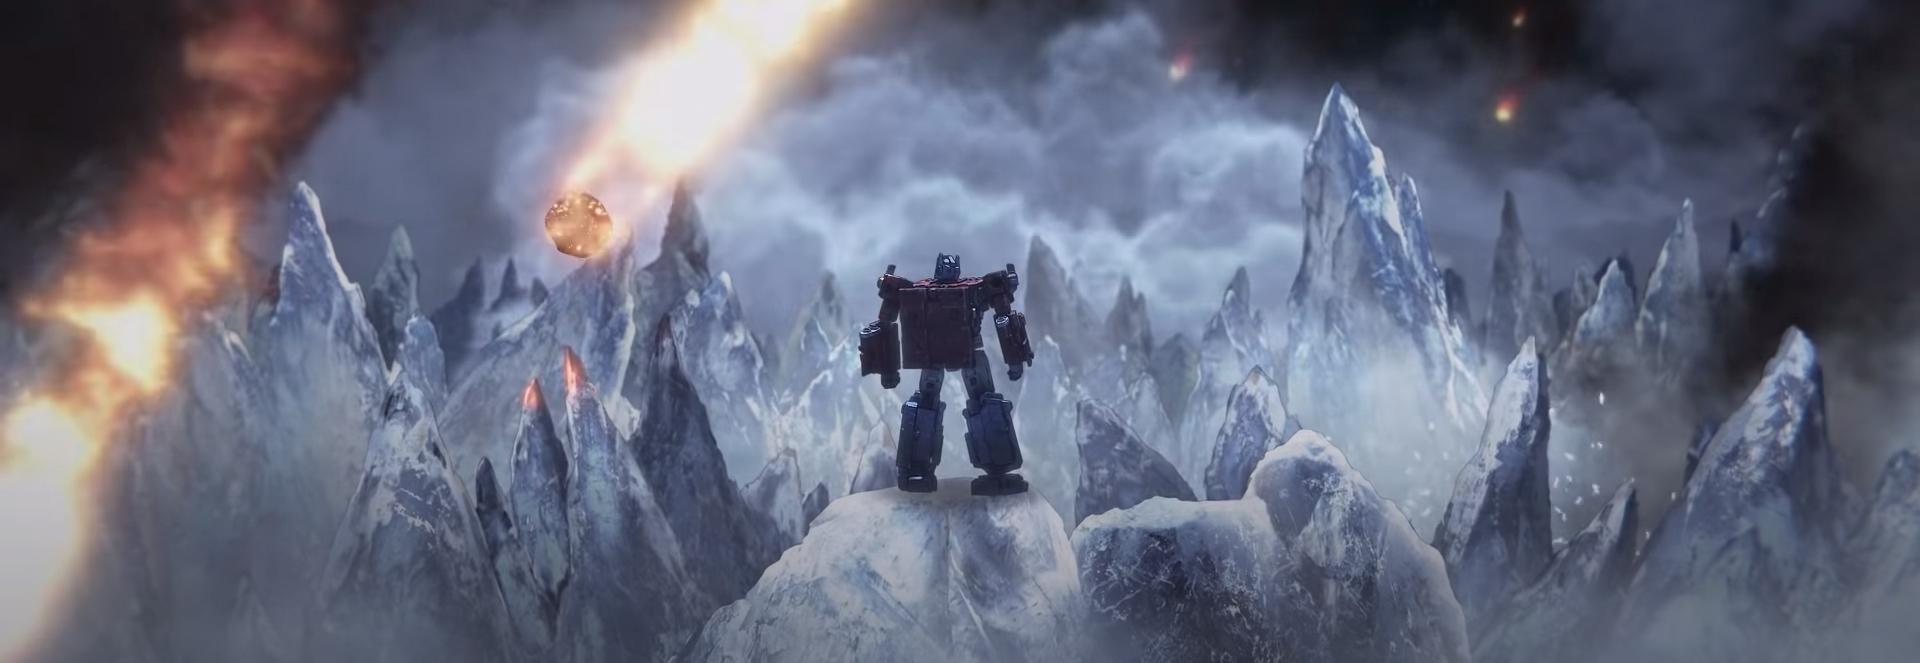 Transformers: War For Cybertron Trilogy – Earthrise. Image Credit: Netflix.